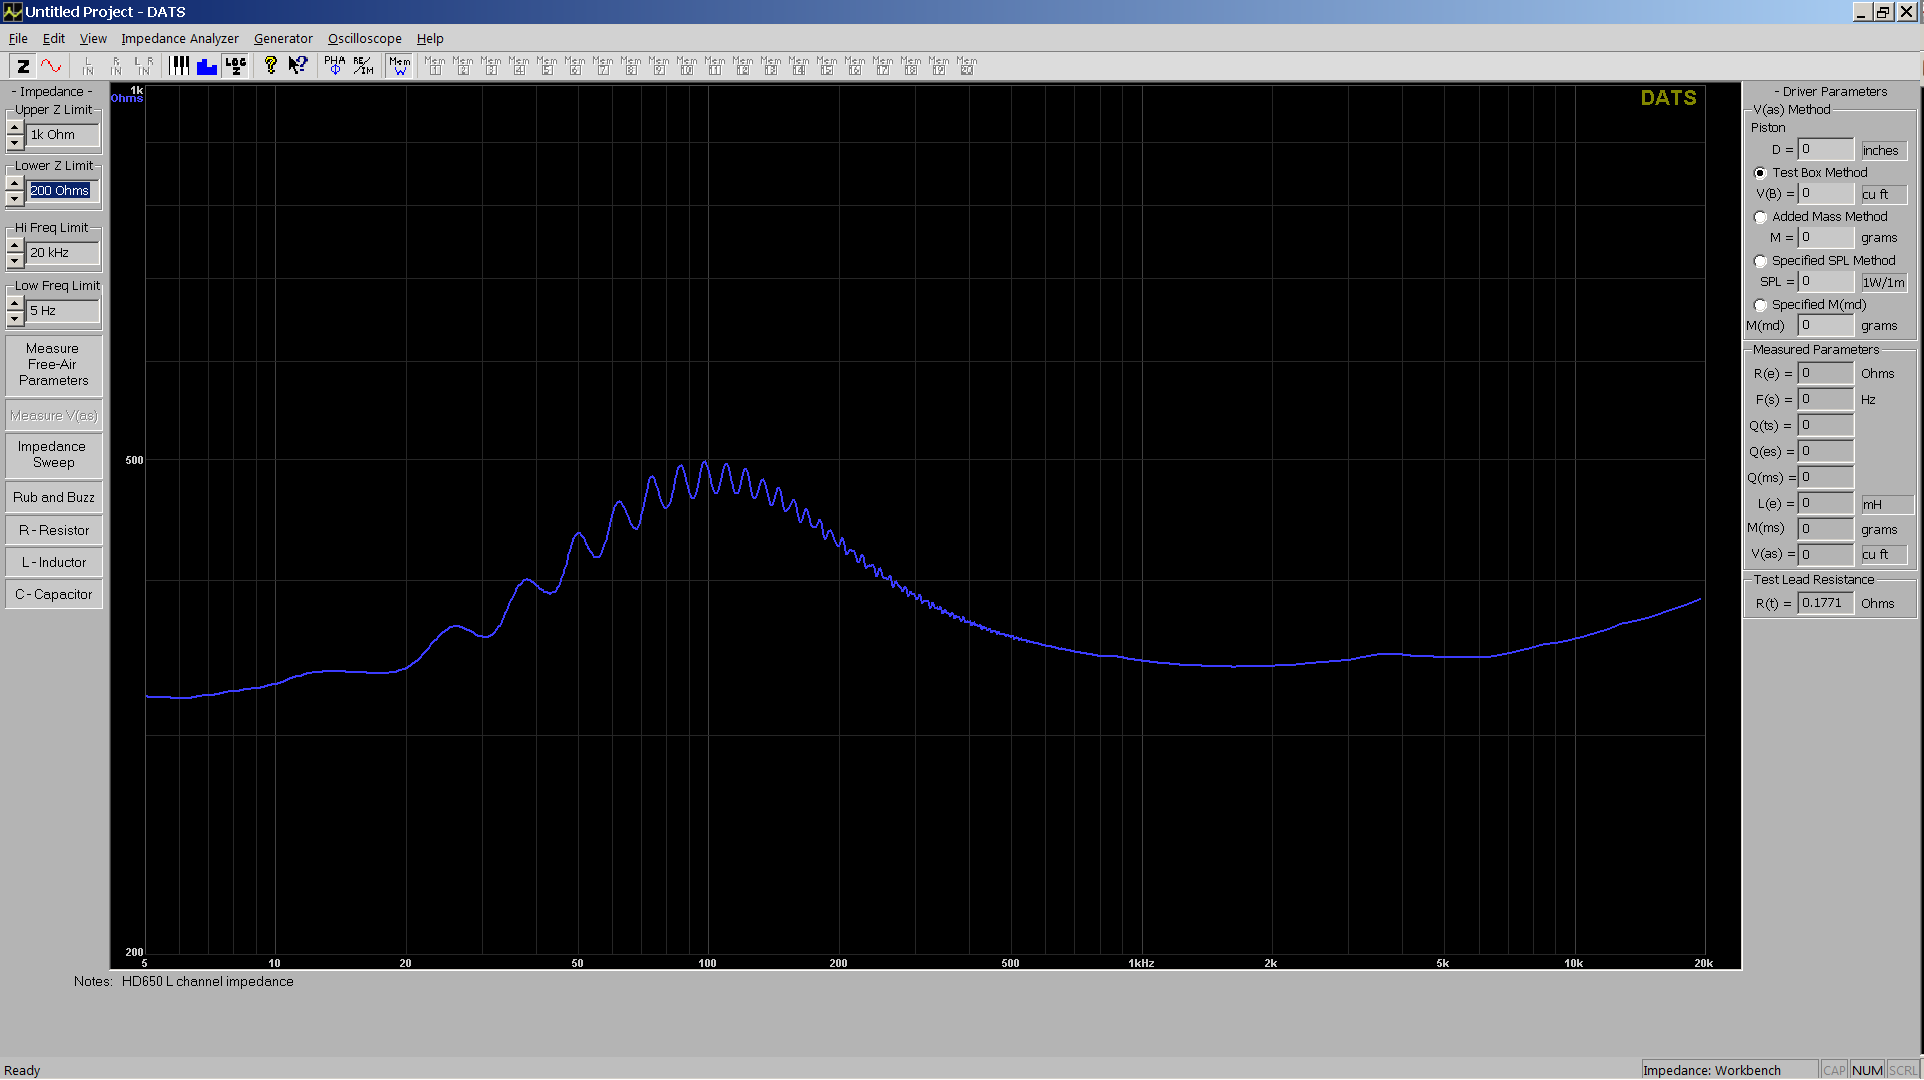 01 20210702 HD650 impedance DATS L.png